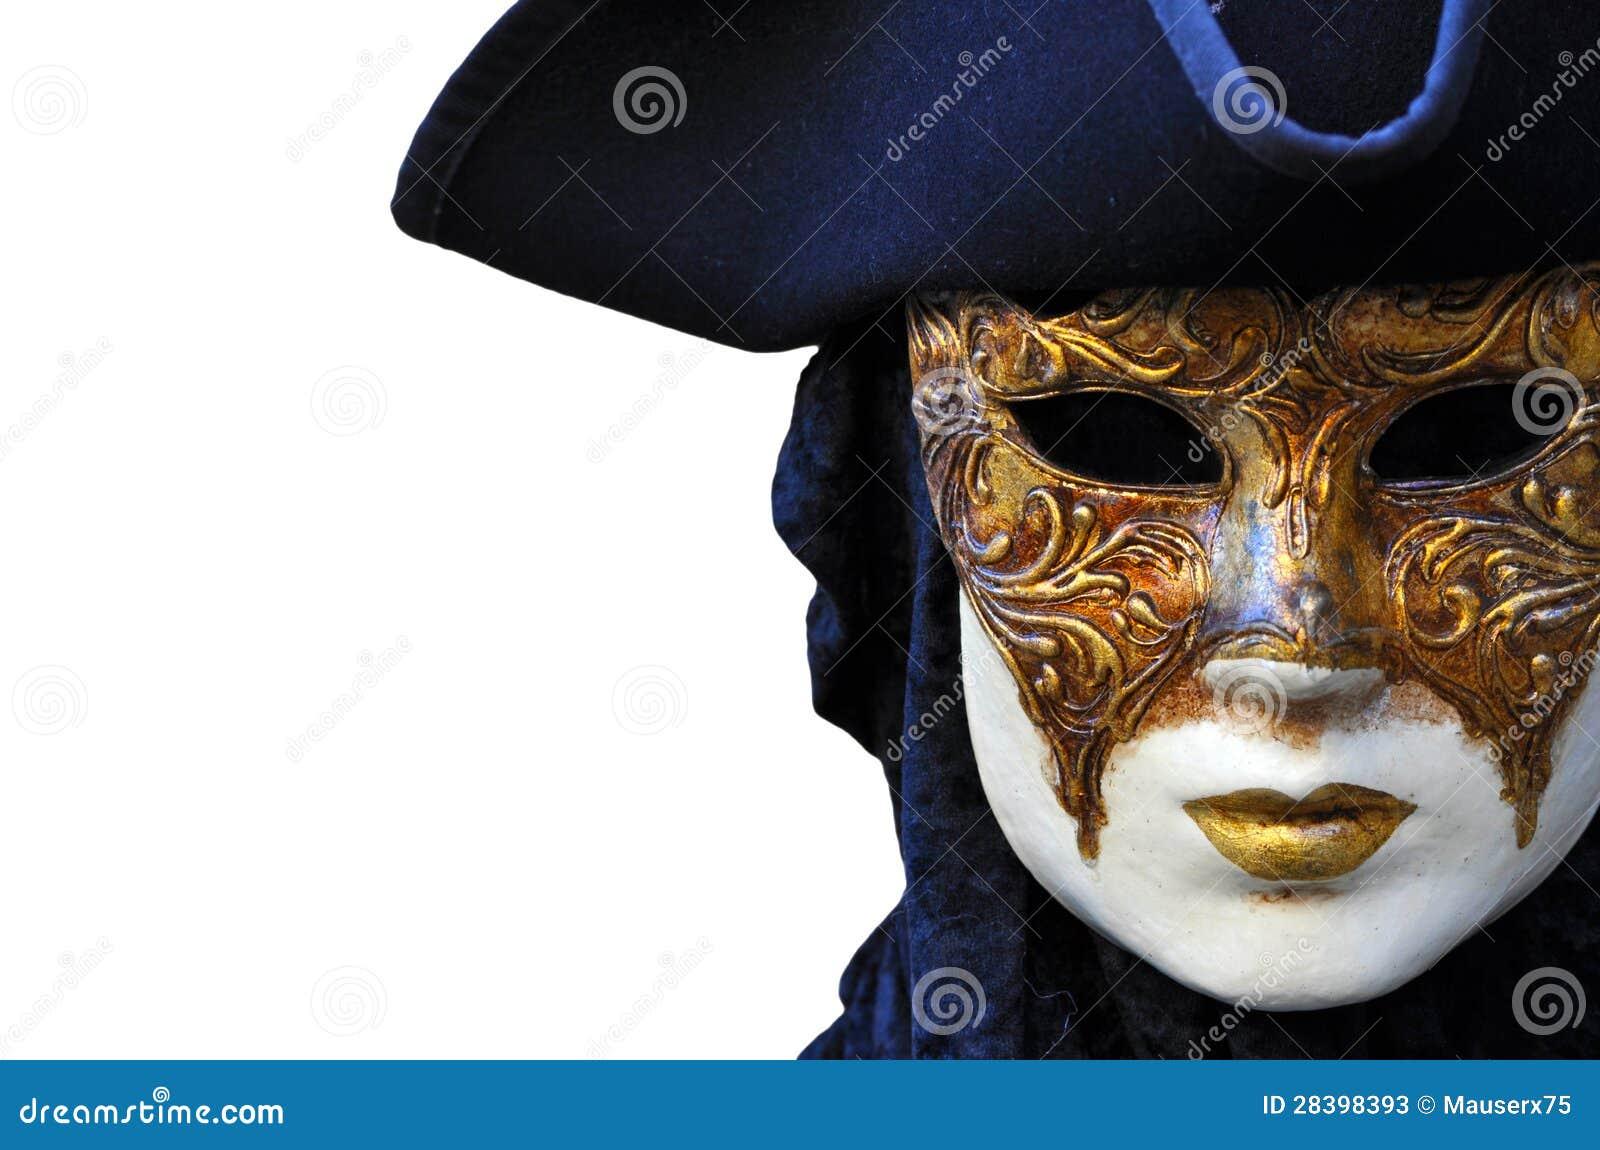 Venezia Carnival Mask stock image  Image of event, artistic